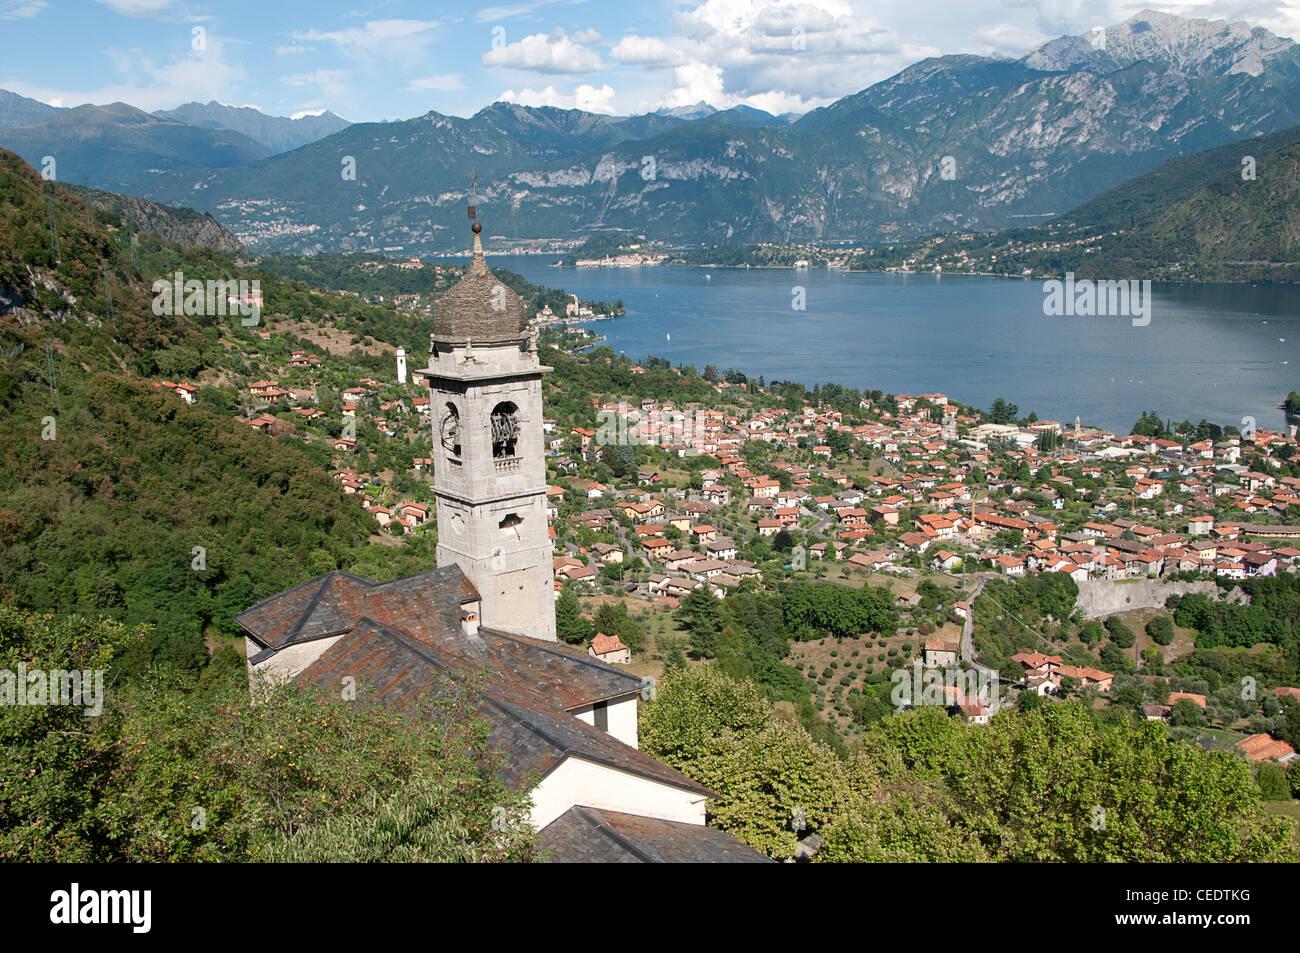 Italy, Lombardy, Lake Como, Sacro Monte di Ossuccio with view of Leno Stock Photo